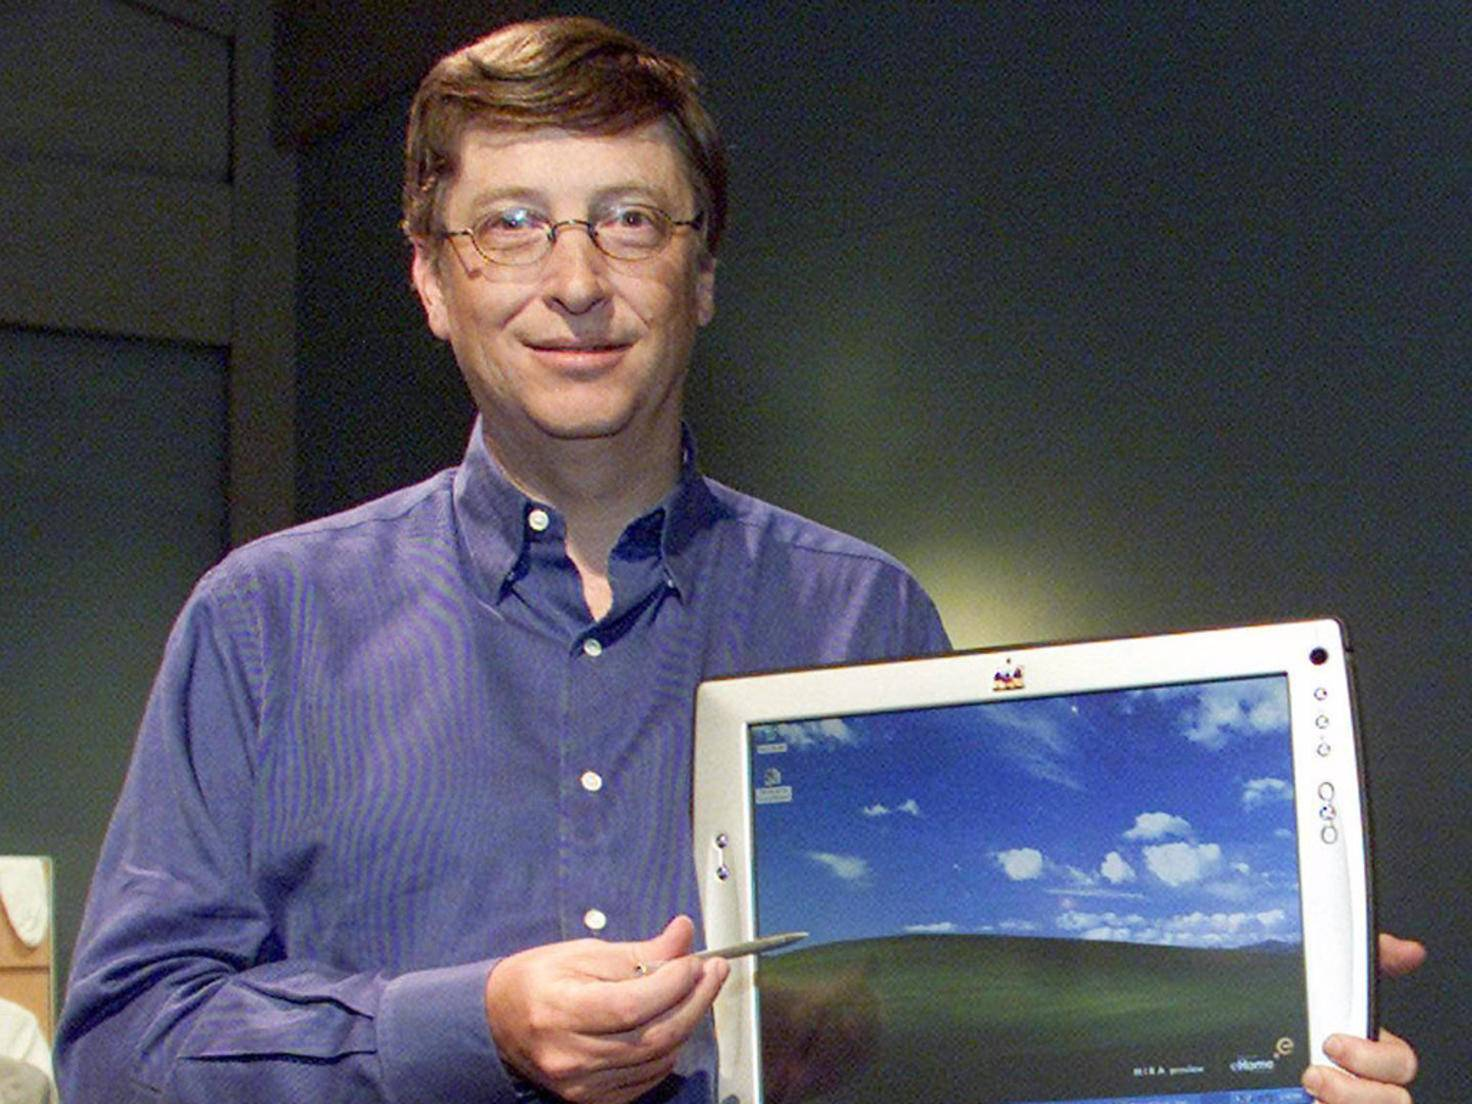 Prophezeiungen der Tech-Bosse: Bill Gates